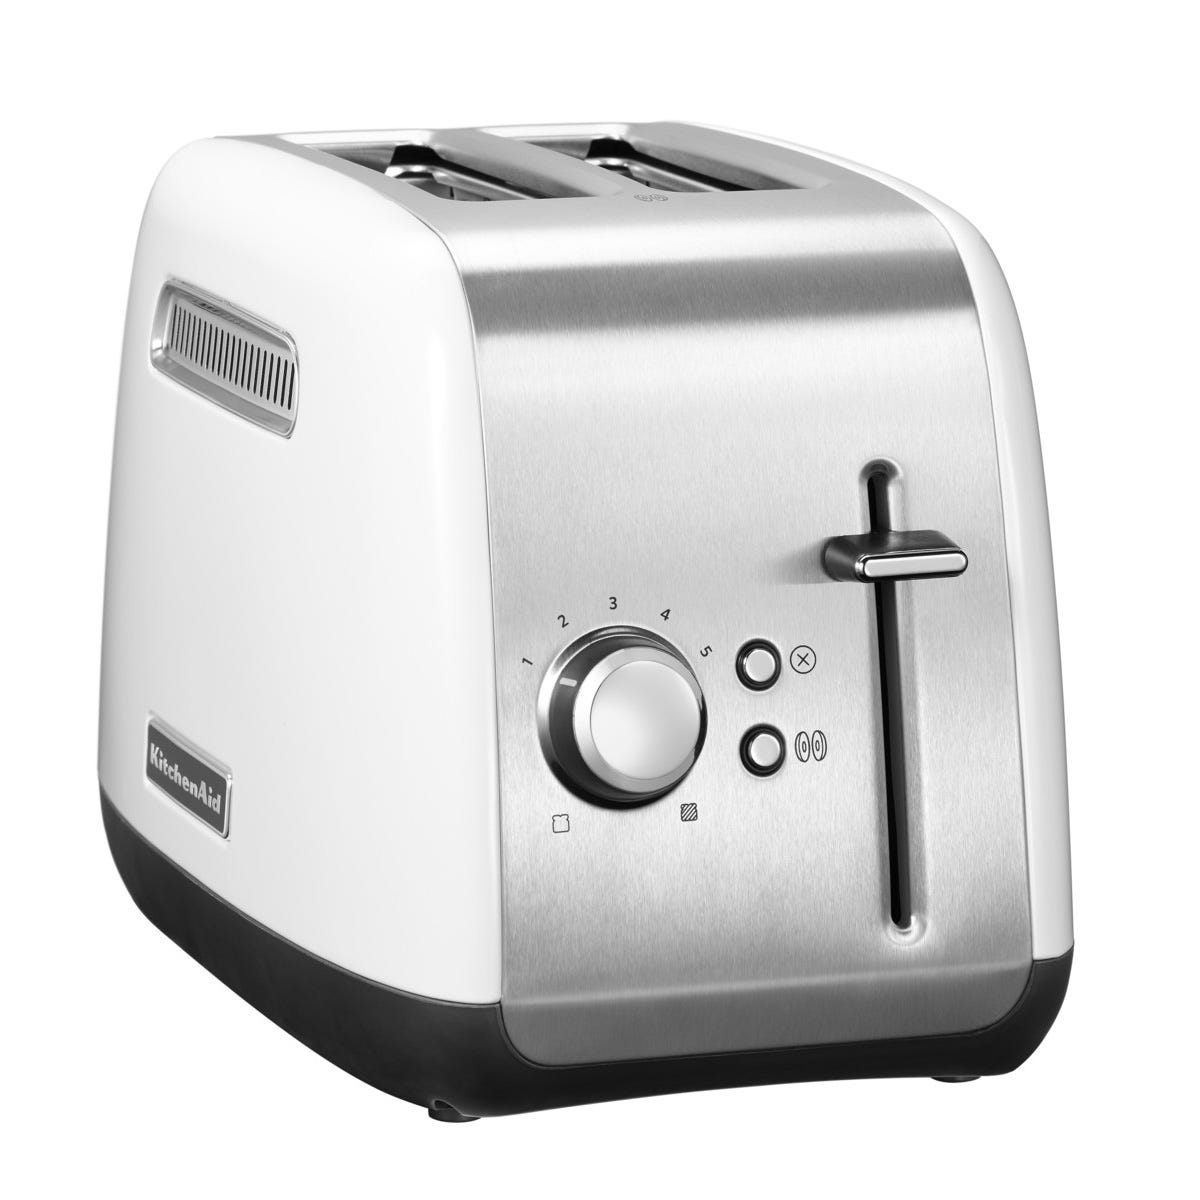 KitchenAid 5KMT2115BWH Toaster 2 Slot - White